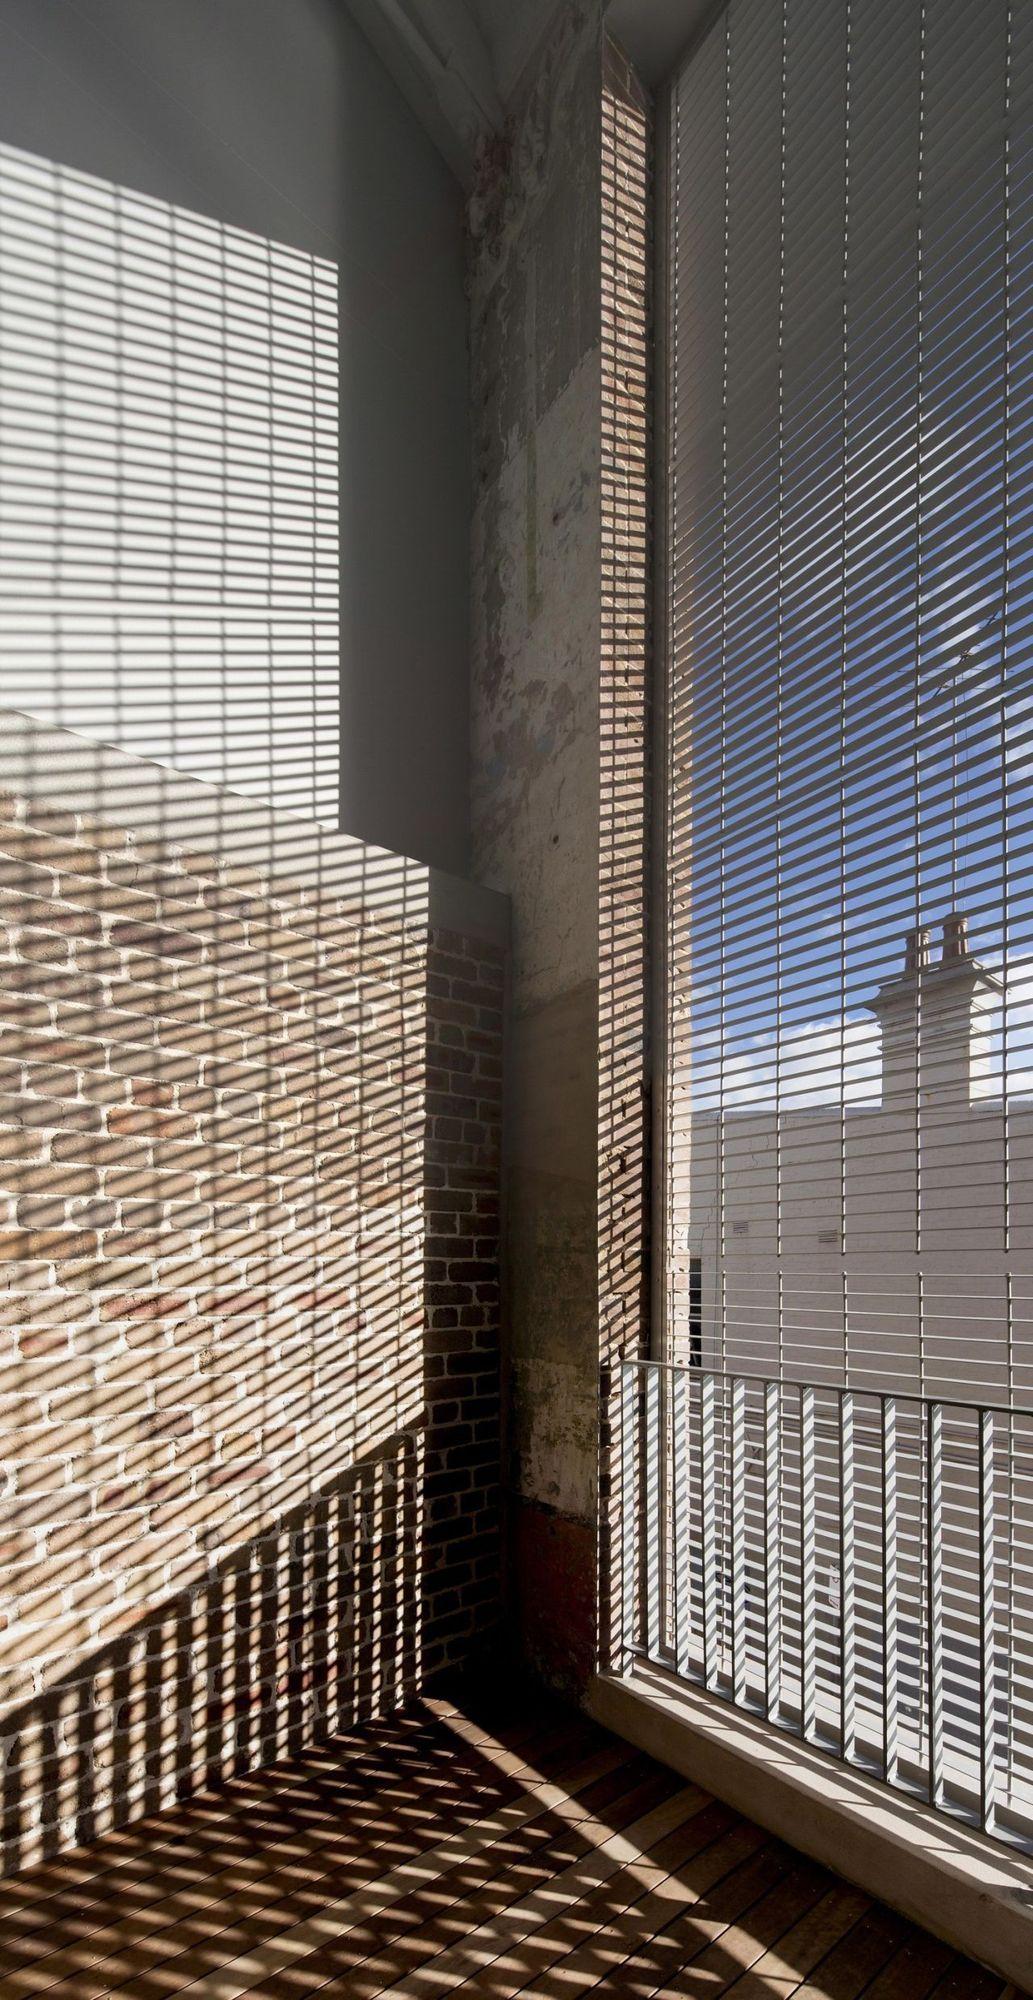 5042346328ba0d7ed10000e6_majestic-theatre-apartments-hill-thalis-architecture-_hillthalis_majestic_petersham_000019.jpg (1033×2000)